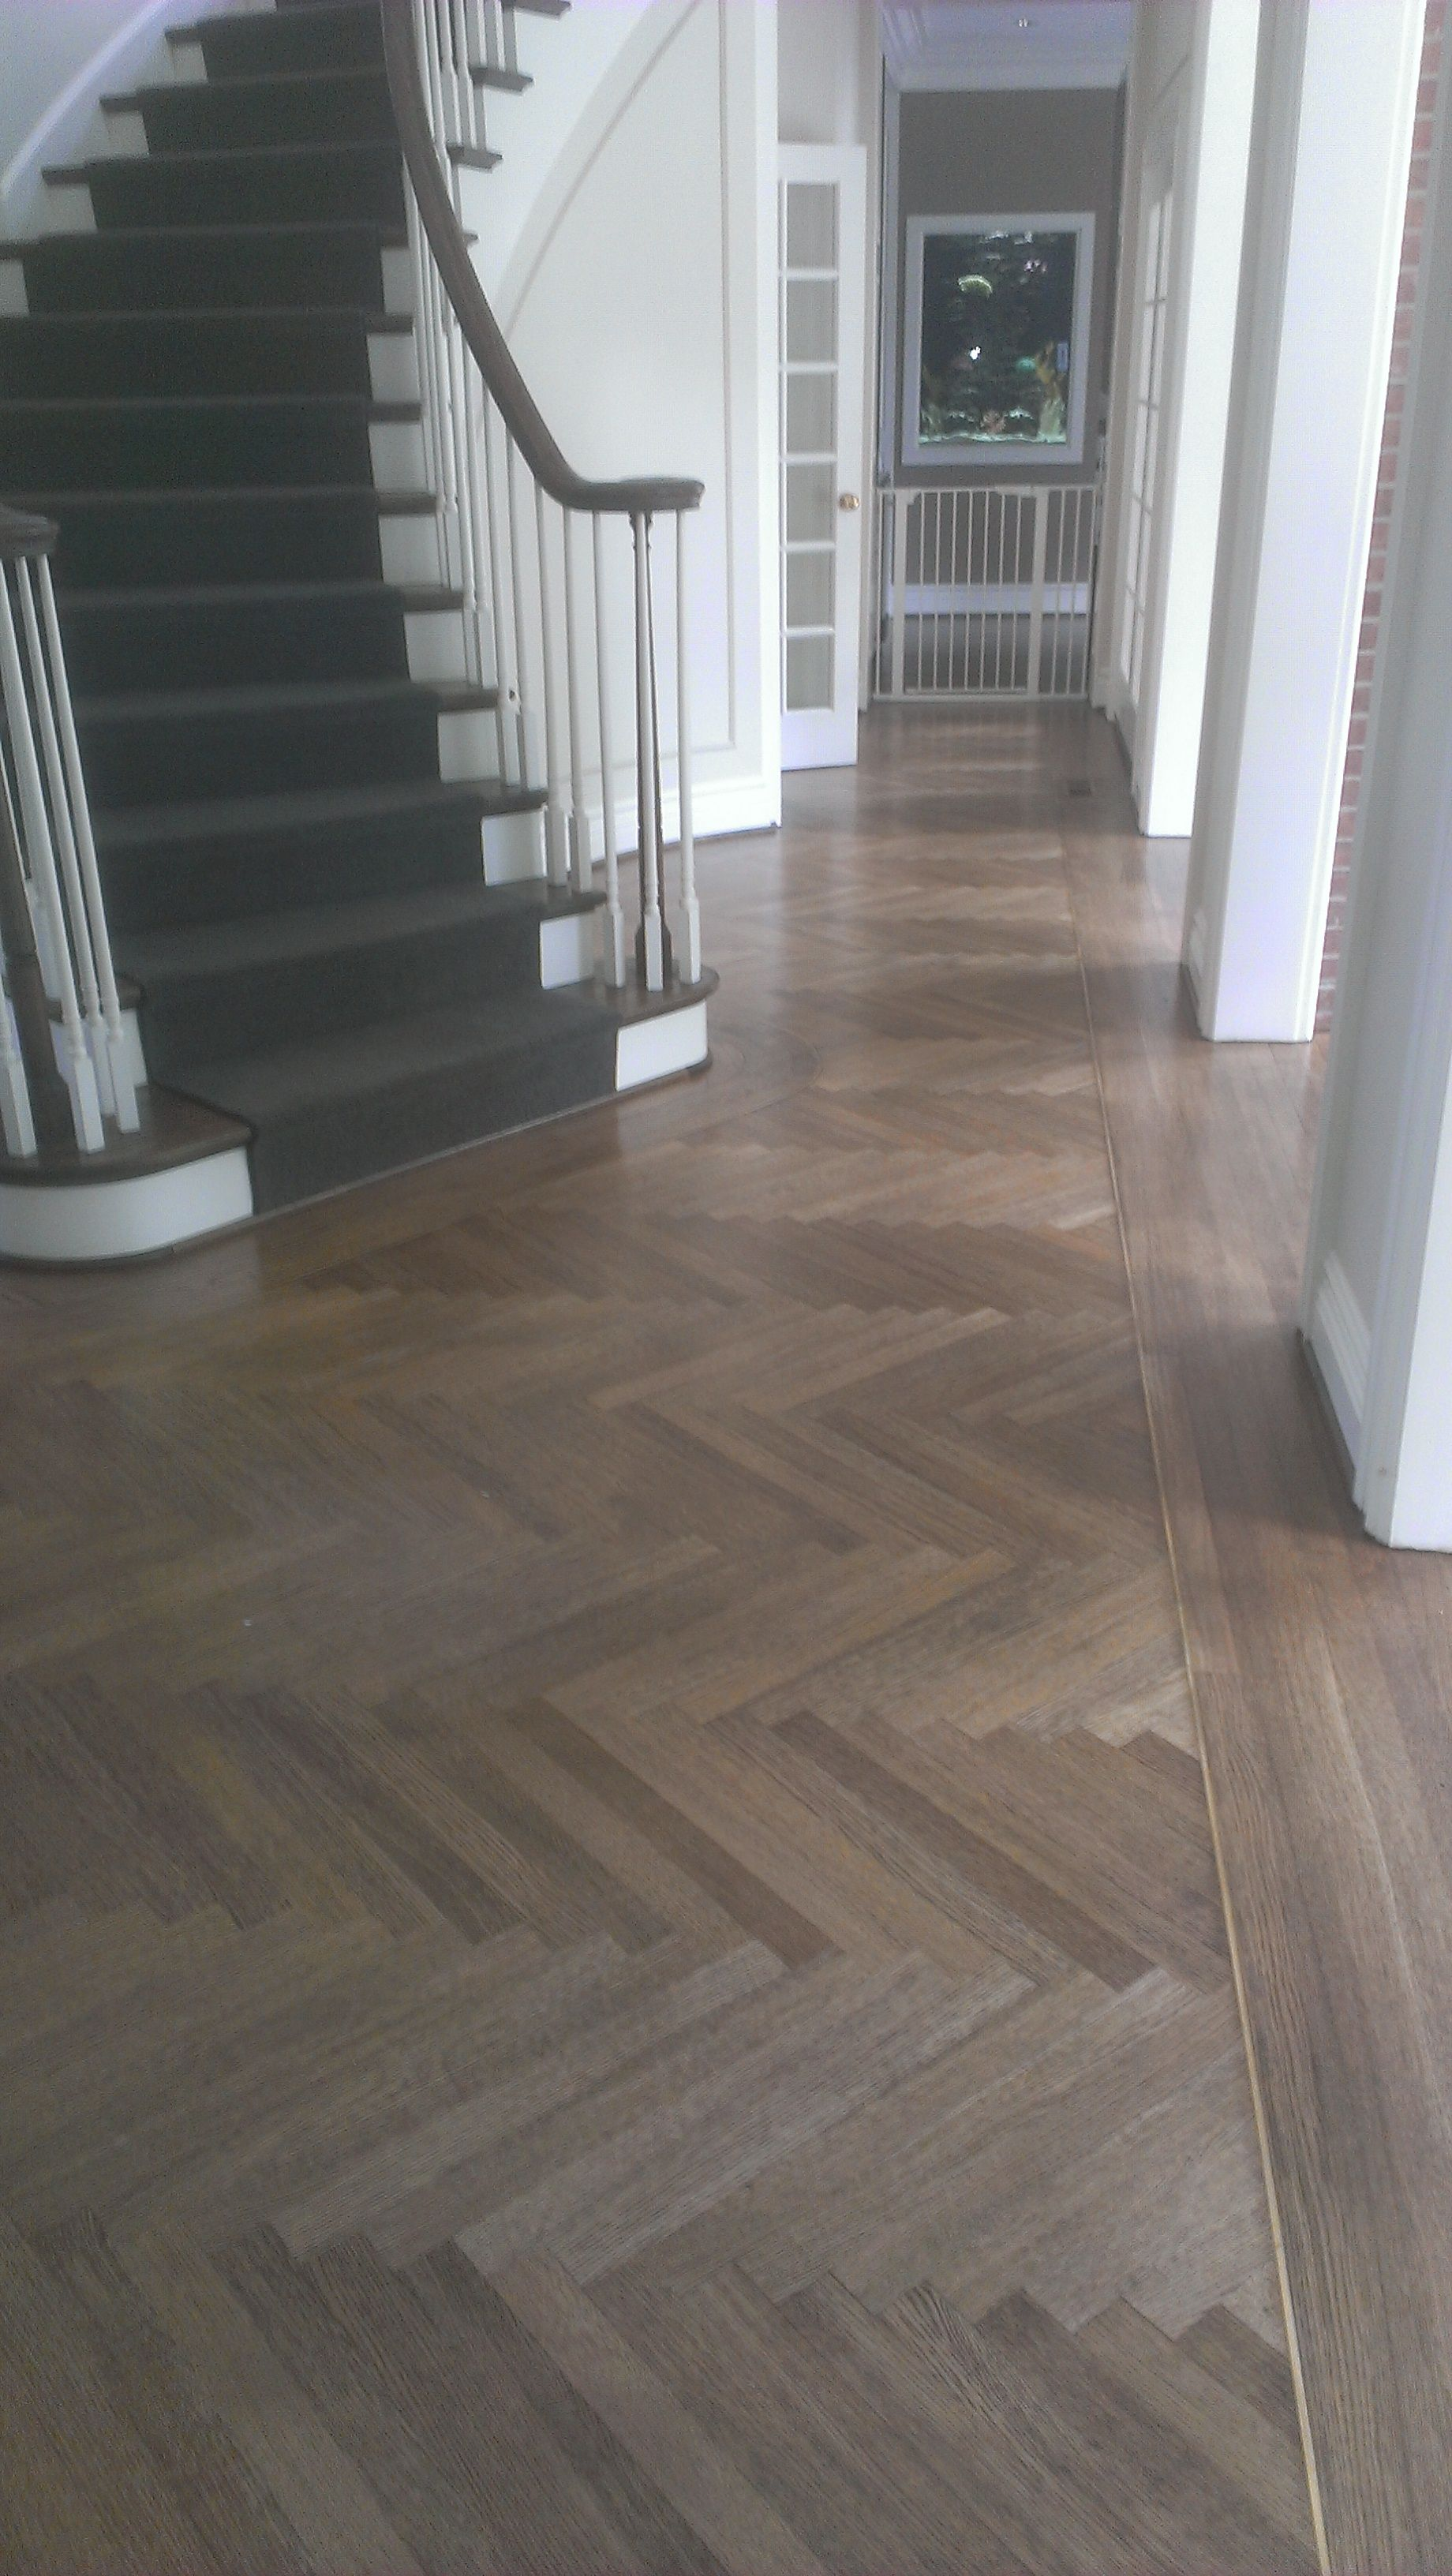 We Do Hardwood Too Herringbone Field With 1 4 Brass Inlay And Border Dark Laminate Floors Wood Floor Design Flooring